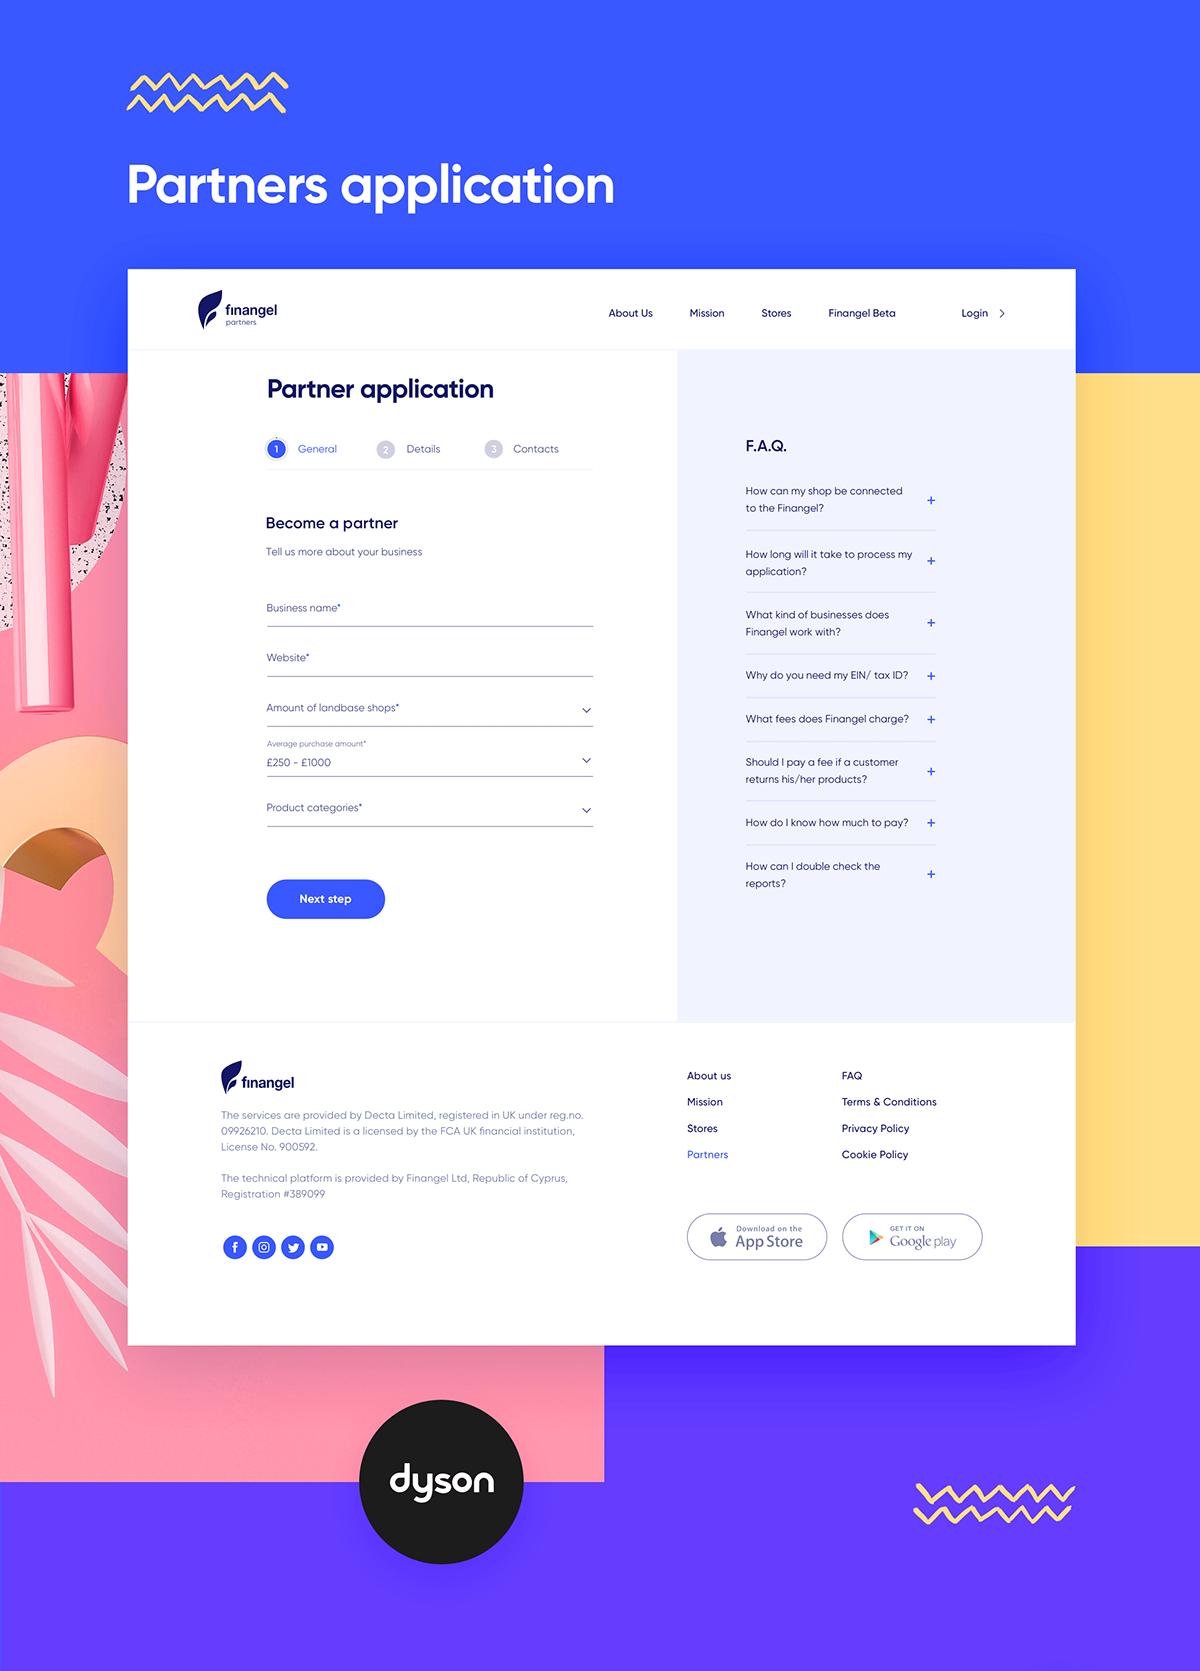 Finangel Partners On Behance Web App Design Web Design User Interface Web Design